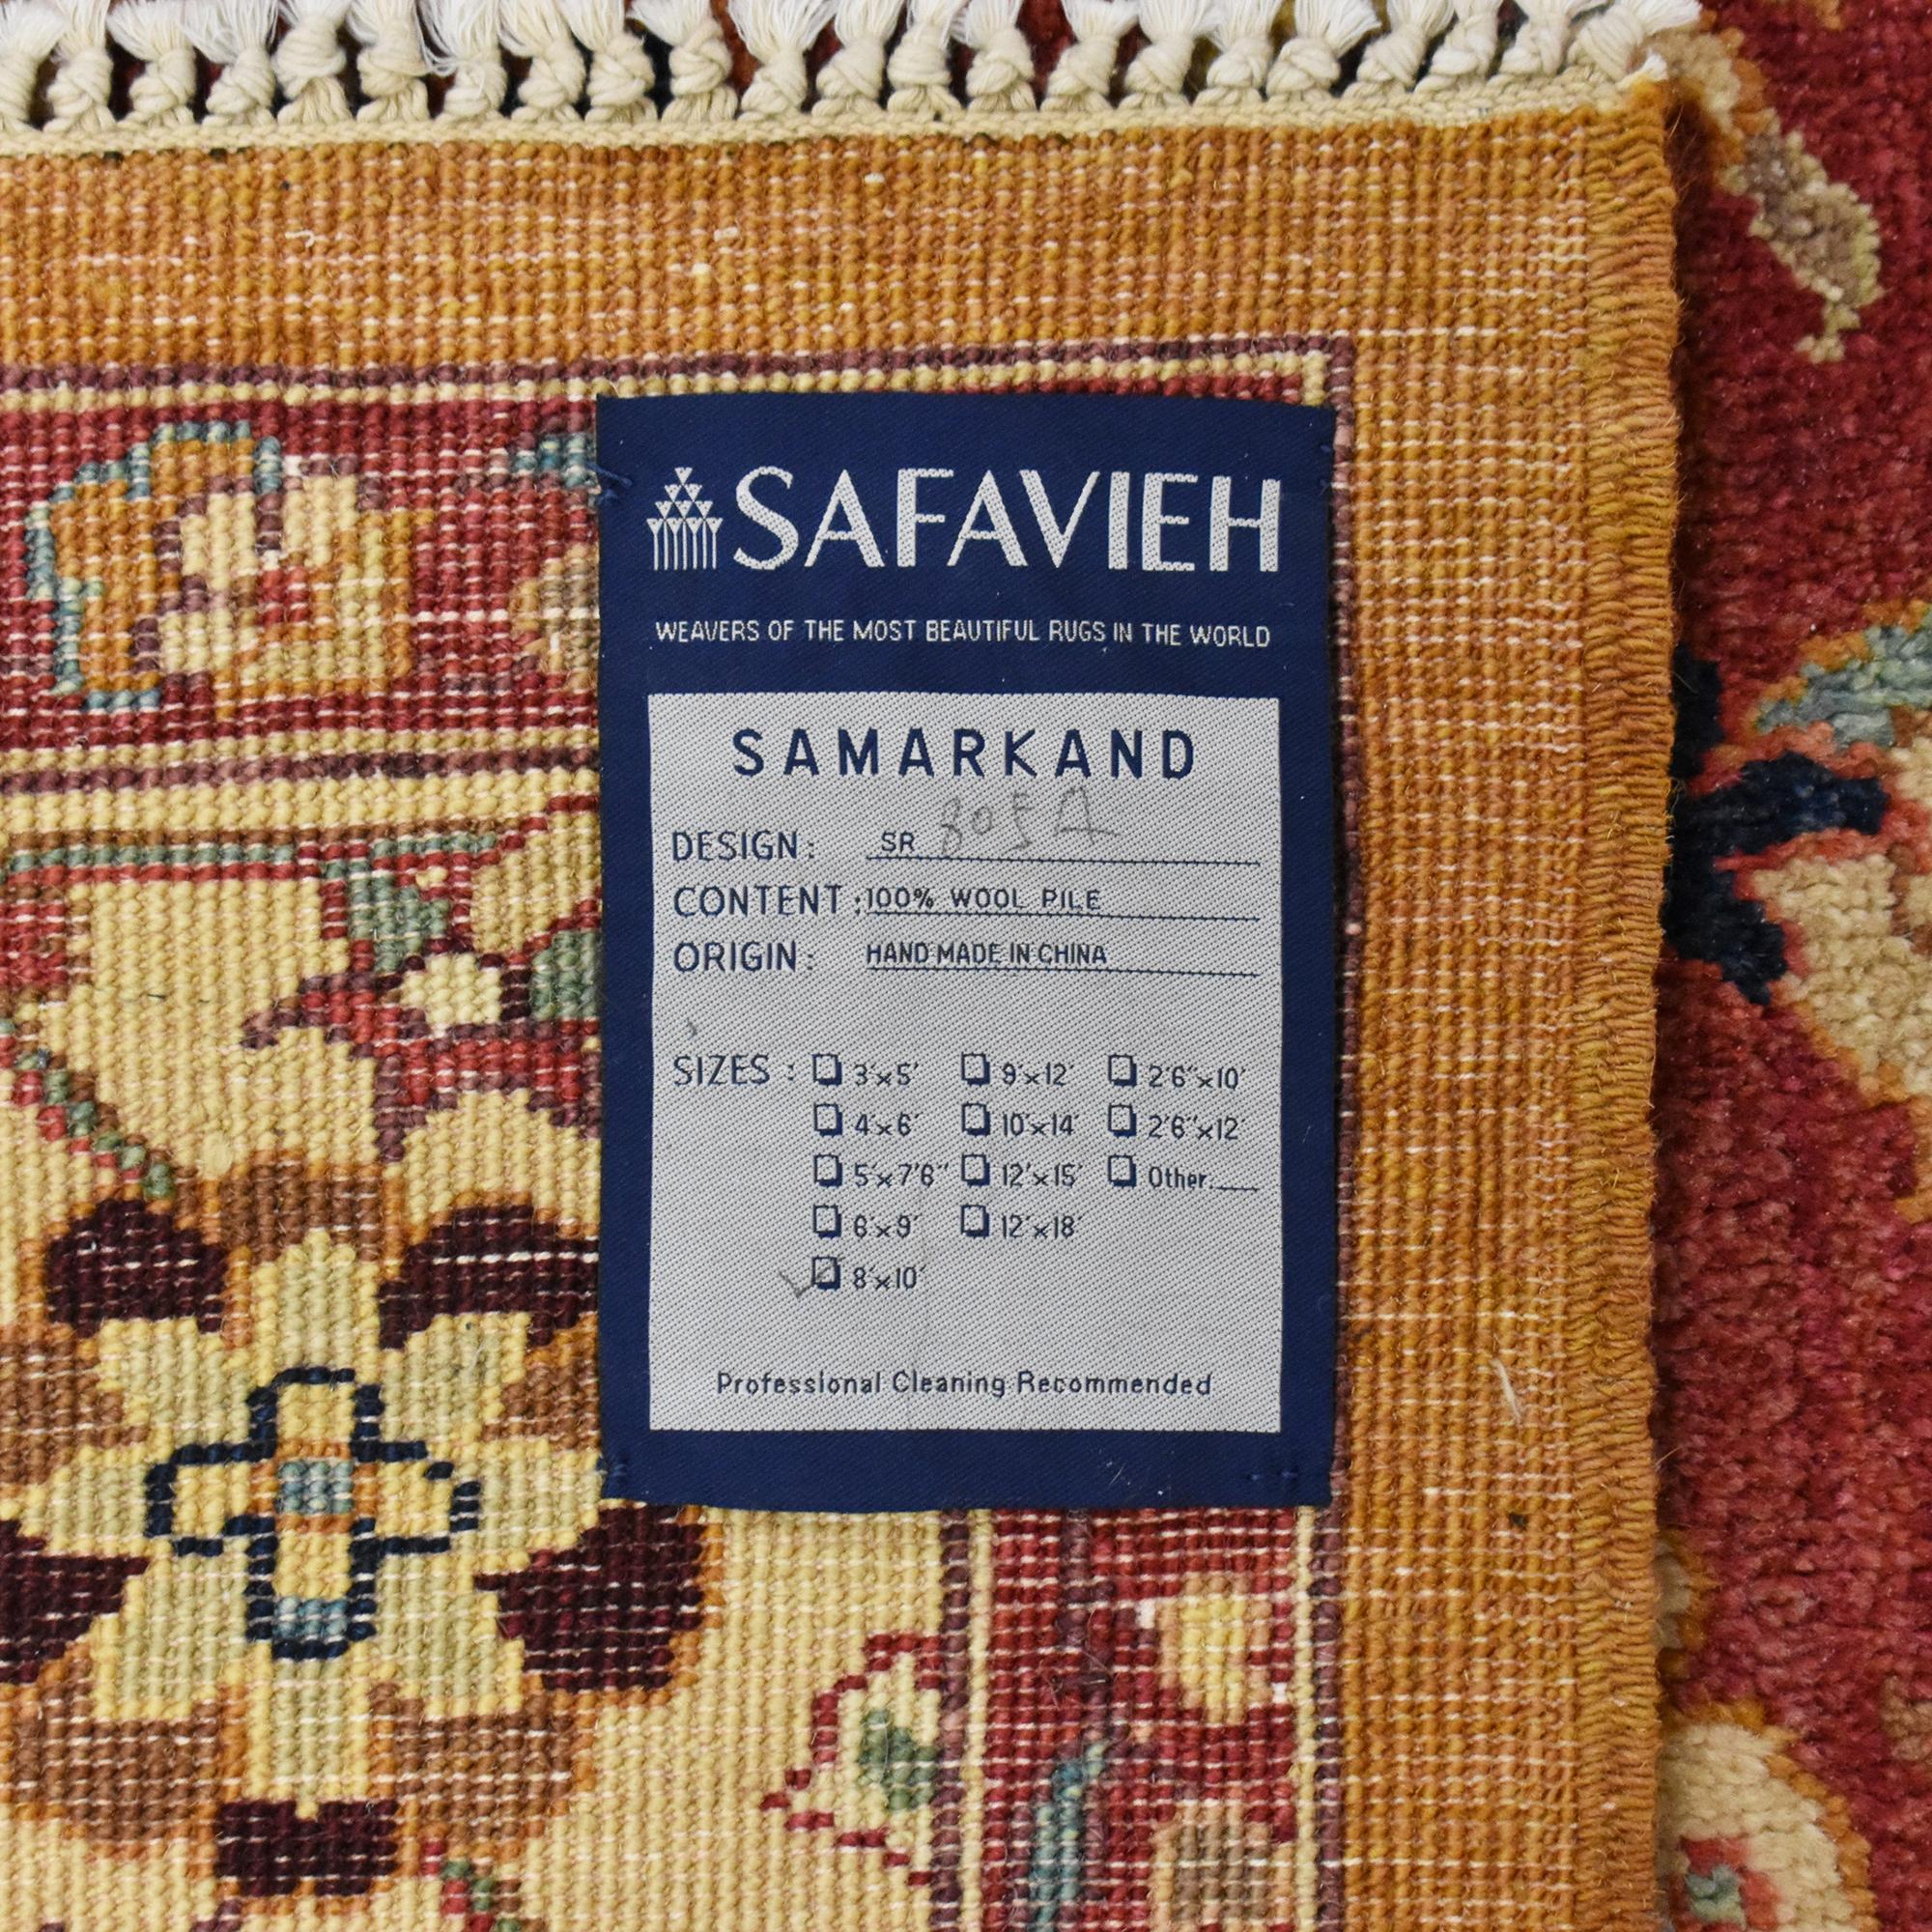 Safavieh Safavieh Samarkand Area Rug ct